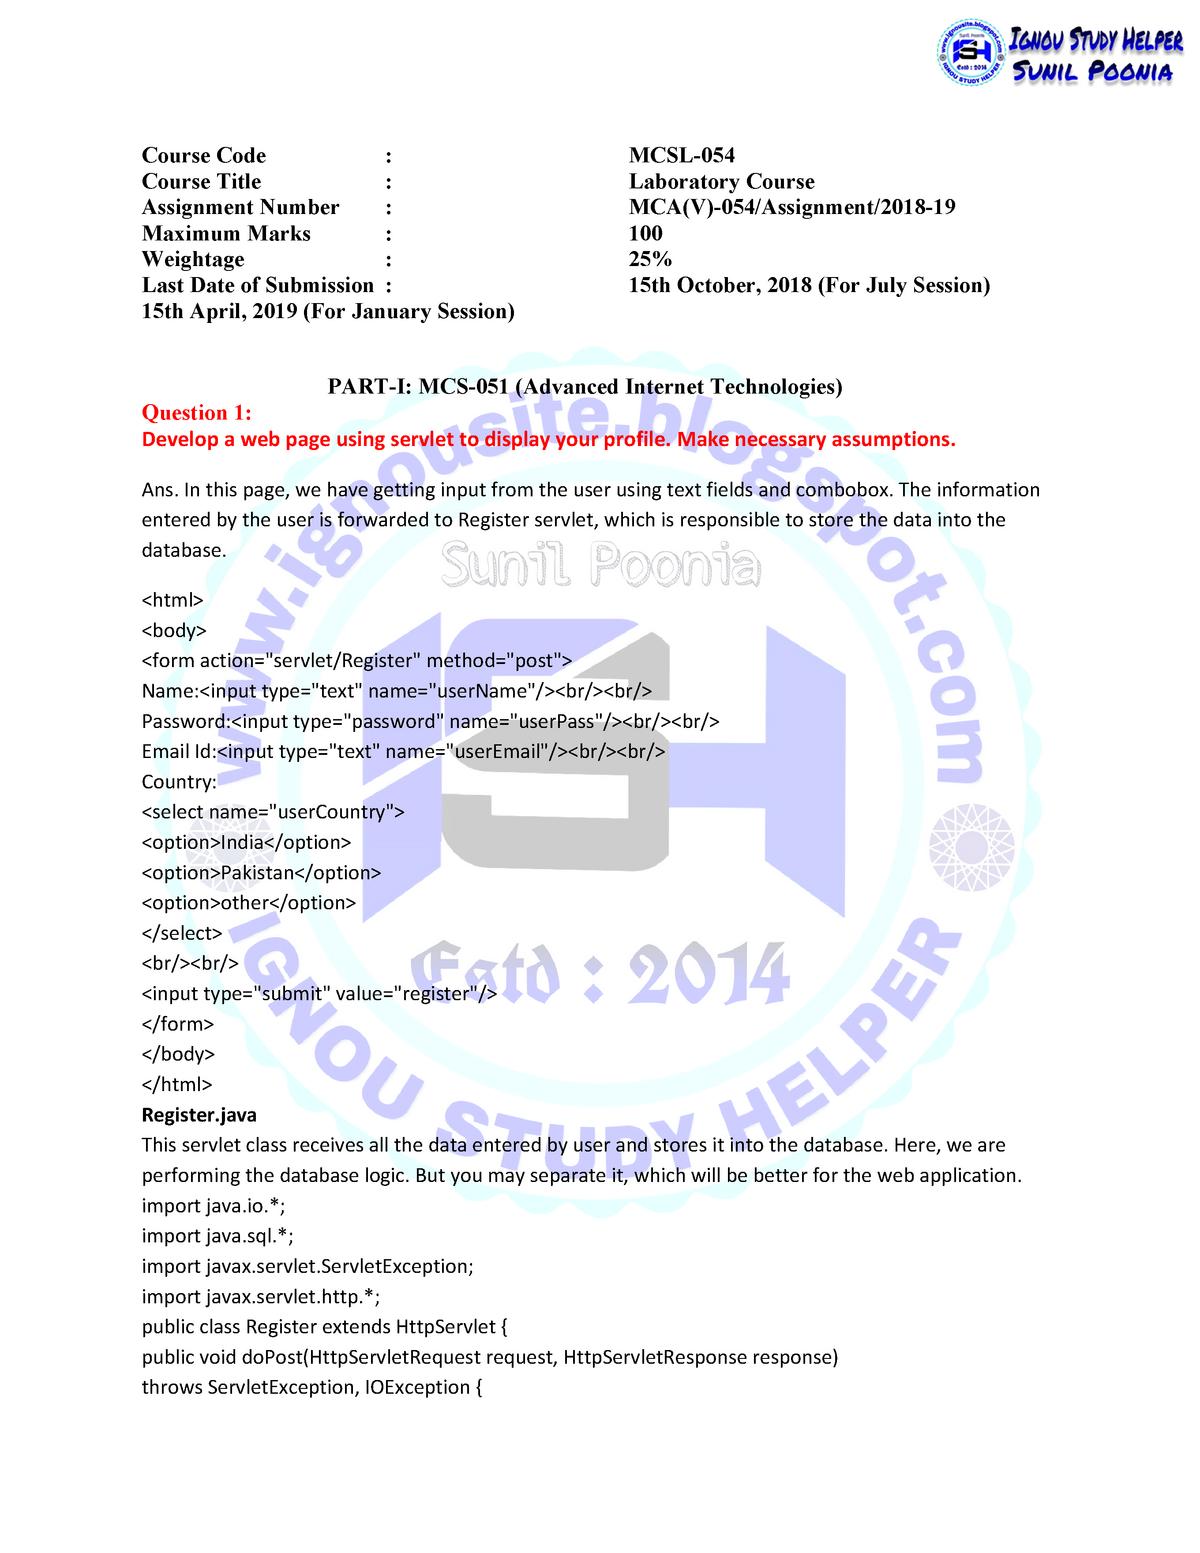 MCSL-054 2018-19 - MCSL-054 - ignou - StuDocu